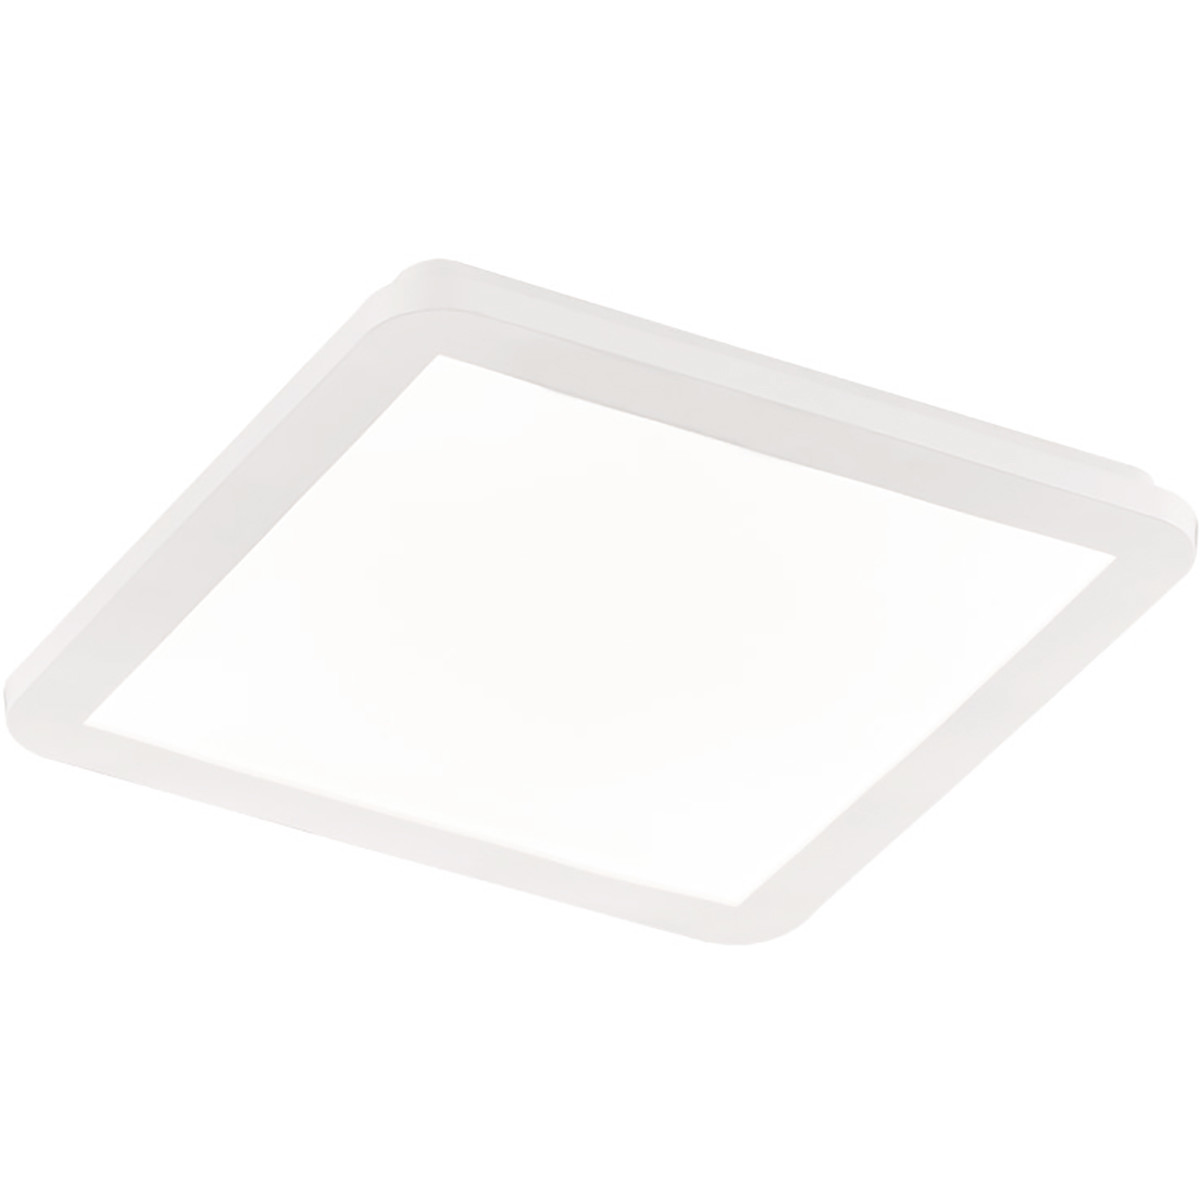 LED Plafondlamp - Trion Camy - Opbouw Vierkant 18W - Spatwaterdicht IP44 - Dimbaar - Warm Wit 3000K